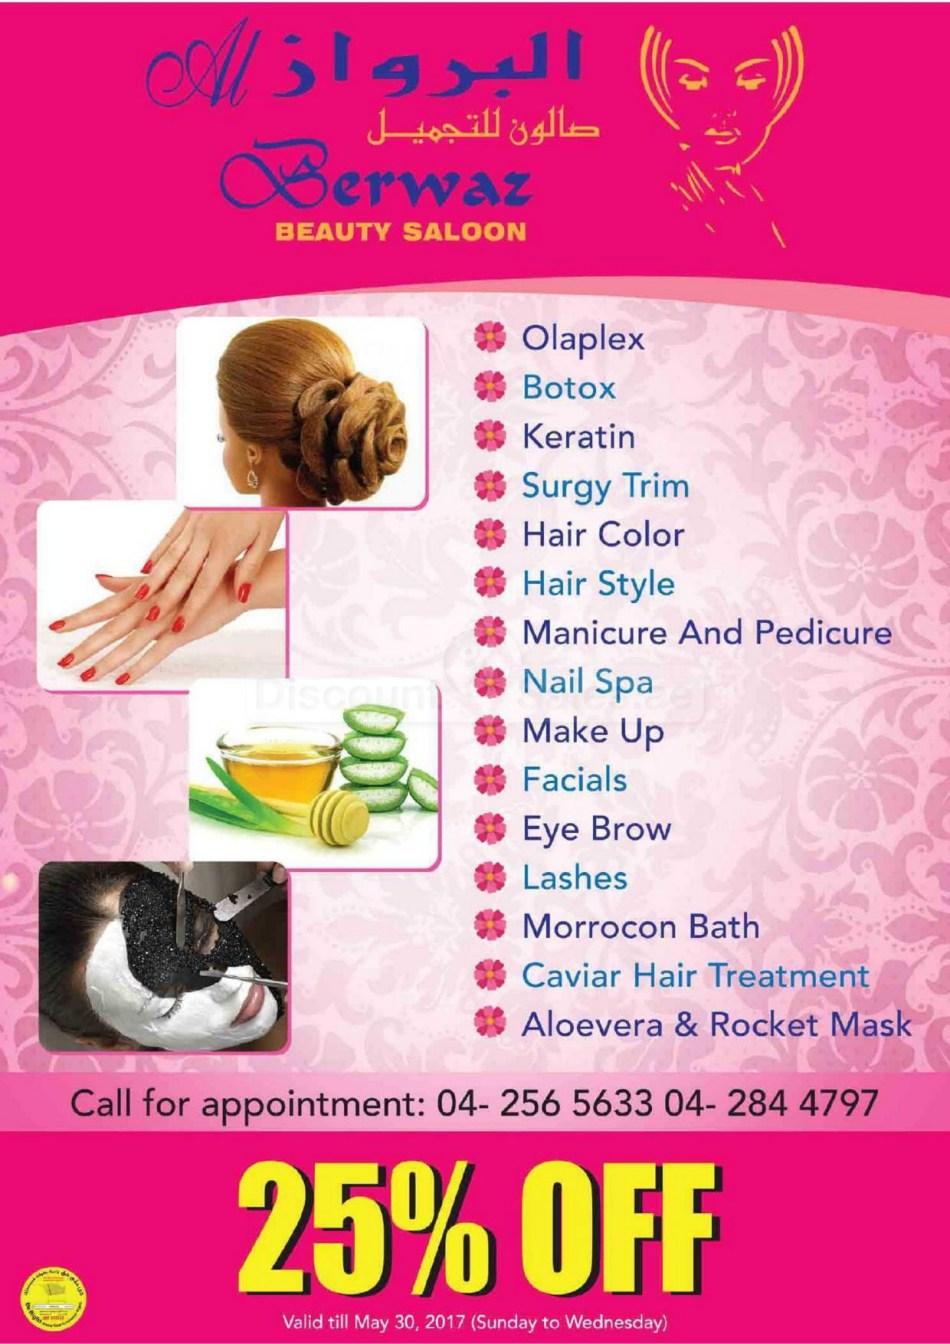 Al Berwaz Beauty Salon 25% OFF